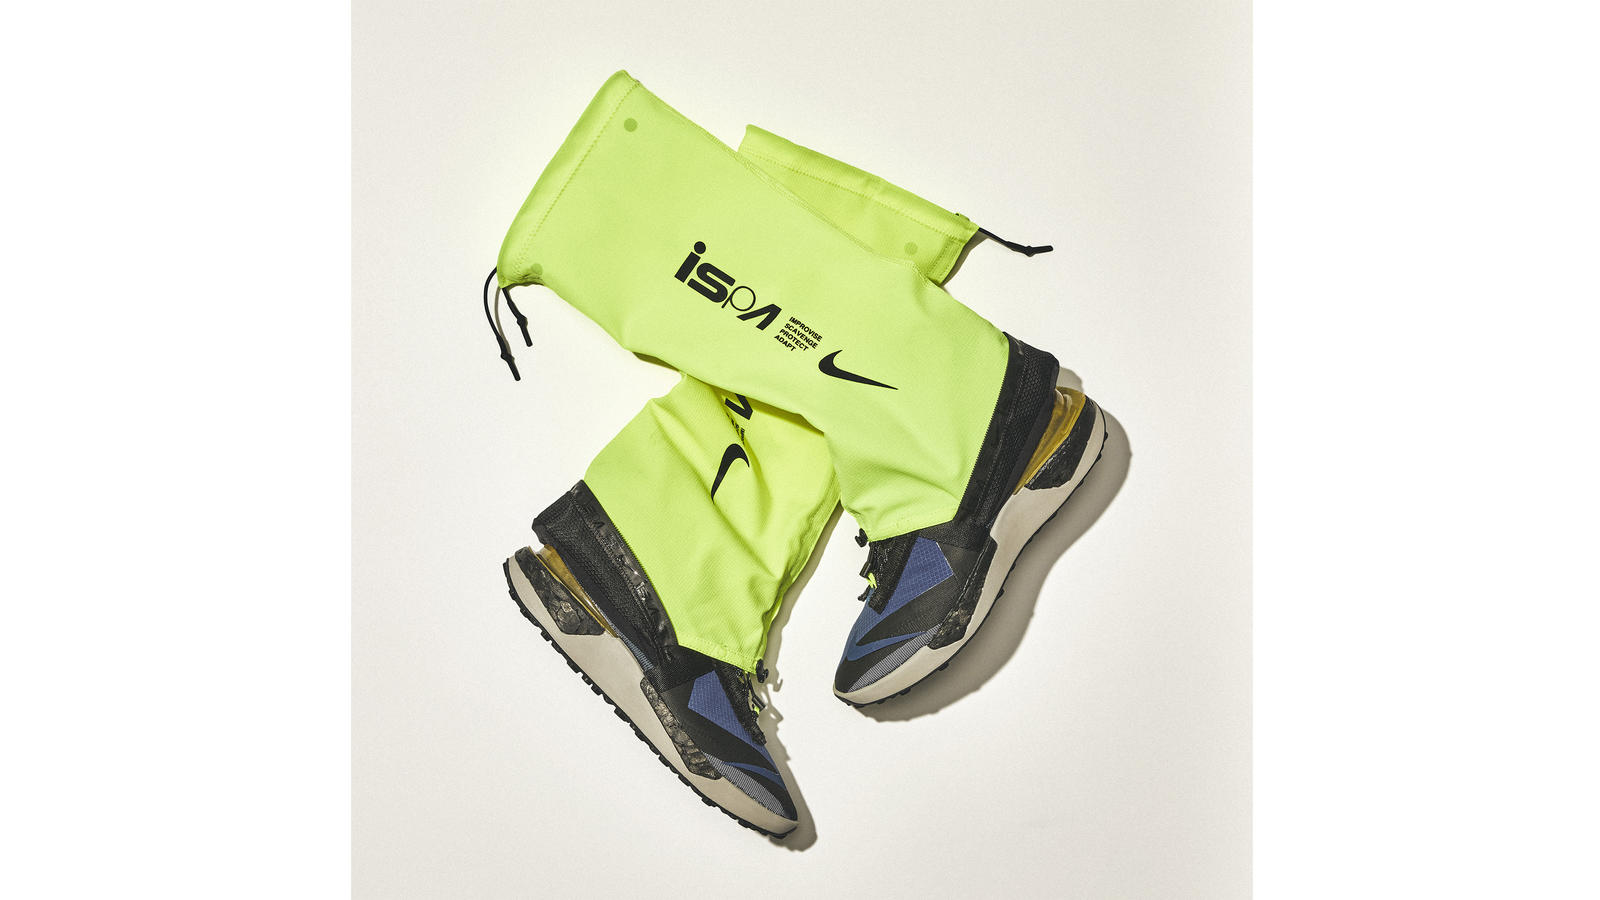 Nike ISPA Drifter Gator 20